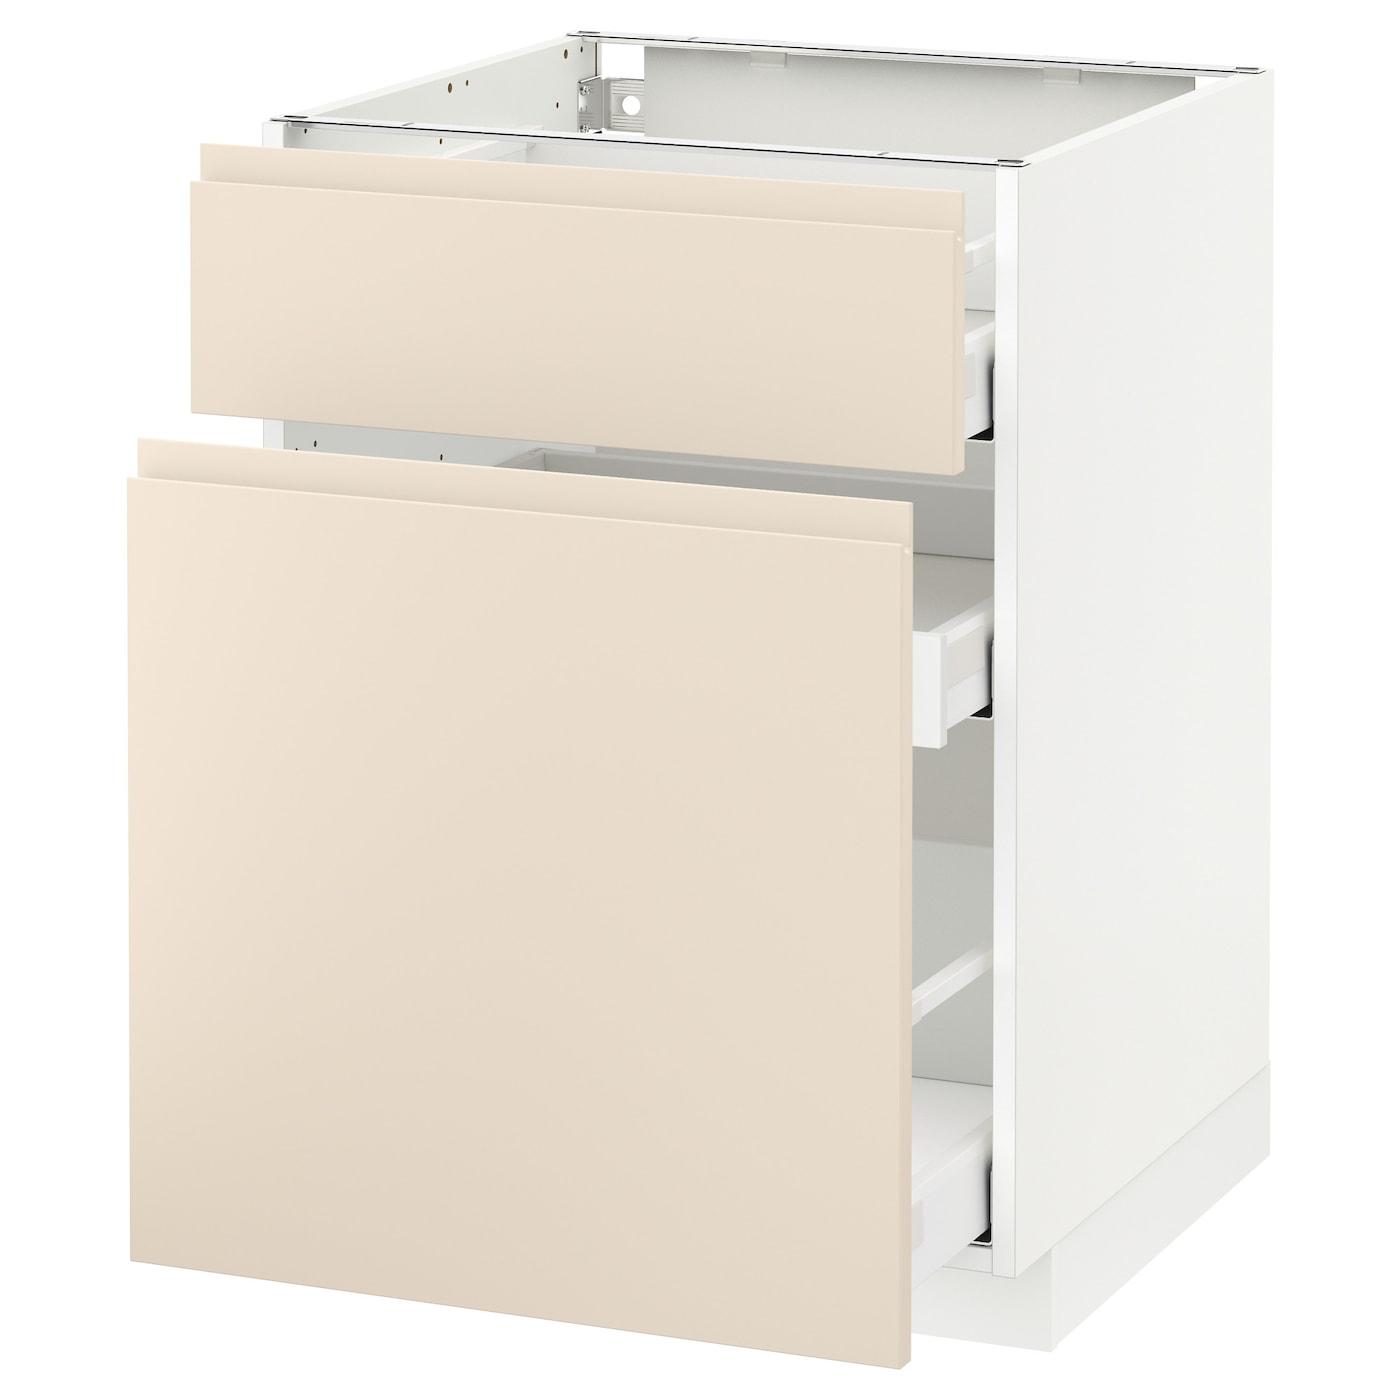 metod maximera base cabinet p out storage drawer white voxtorp light beige 60x60 cm ikea. Black Bedroom Furniture Sets. Home Design Ideas